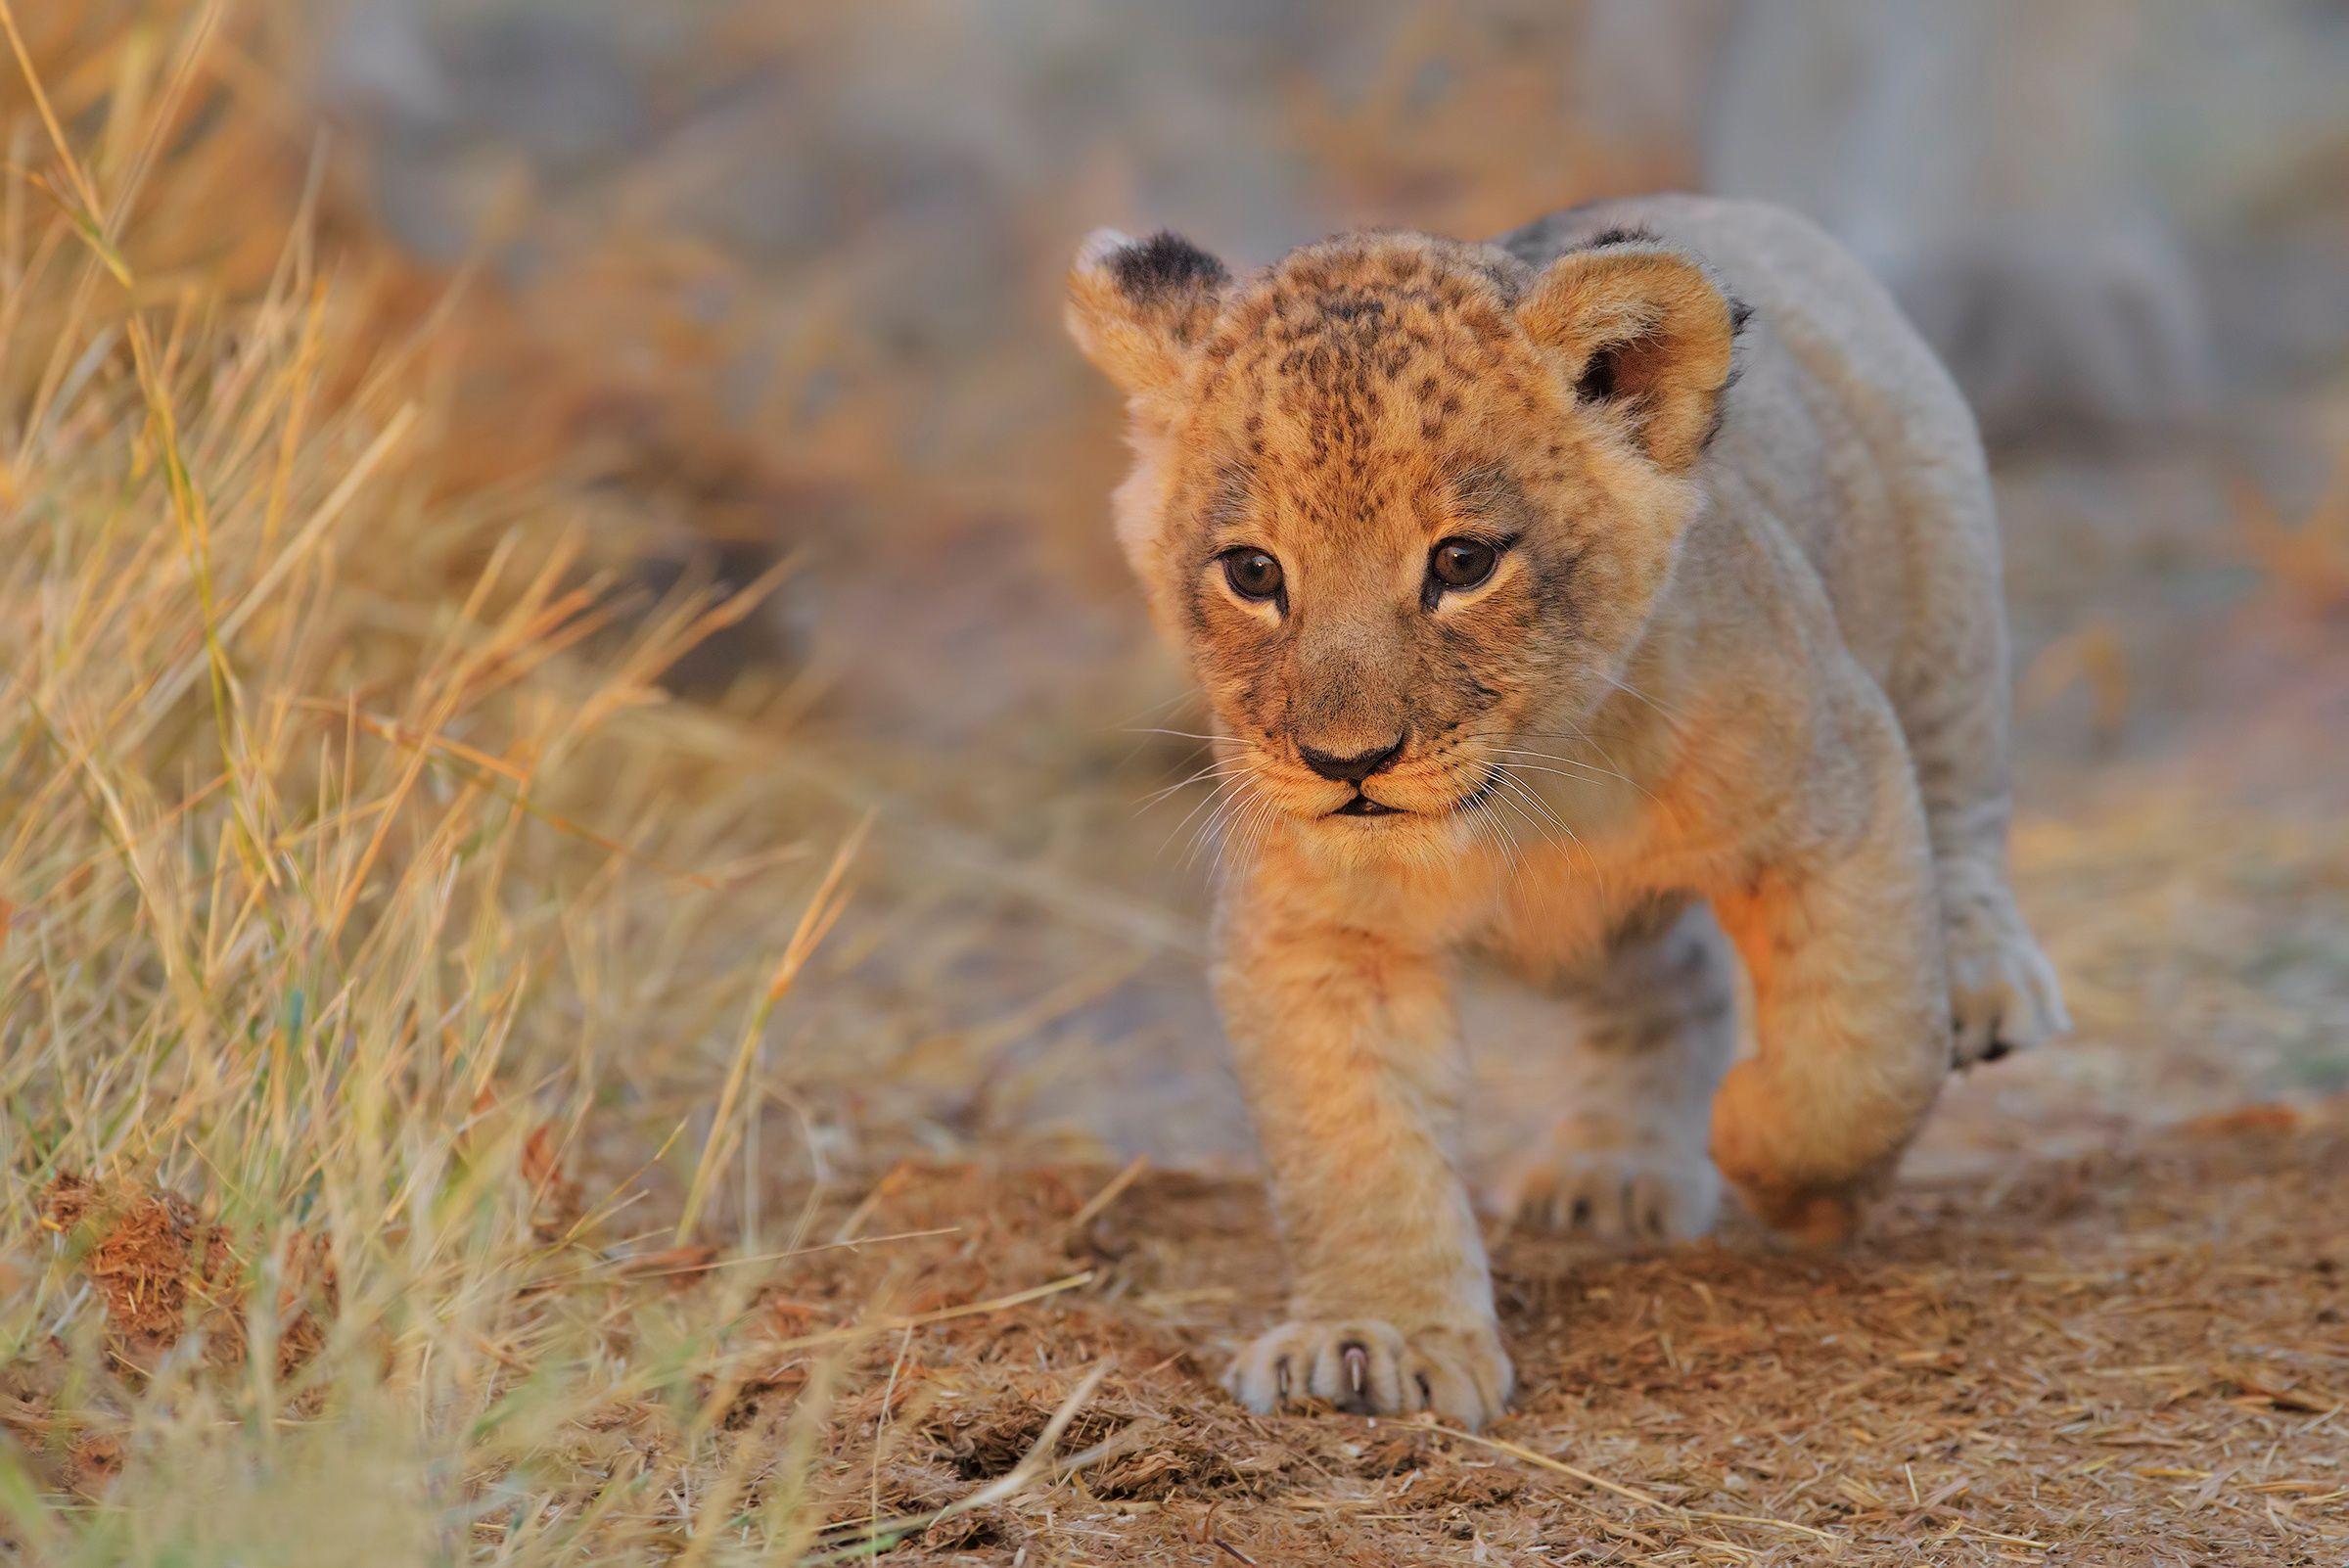 Lion Cub Wallpapers Top Free Lion Cub Backgrounds